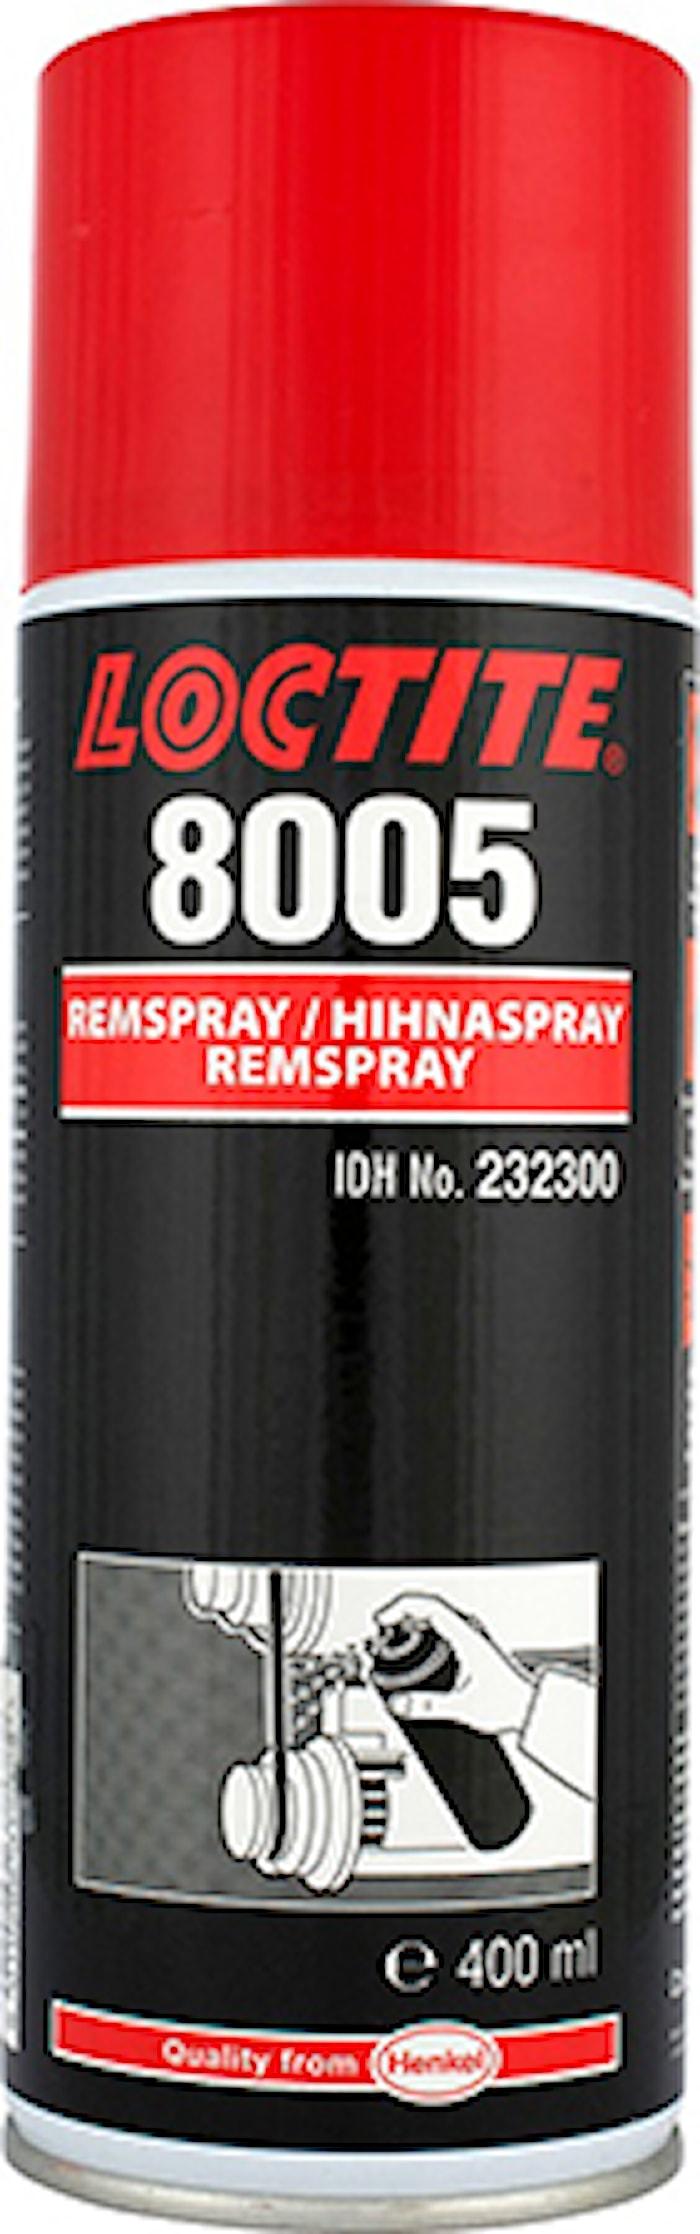 Loctite 8005 400ml spray